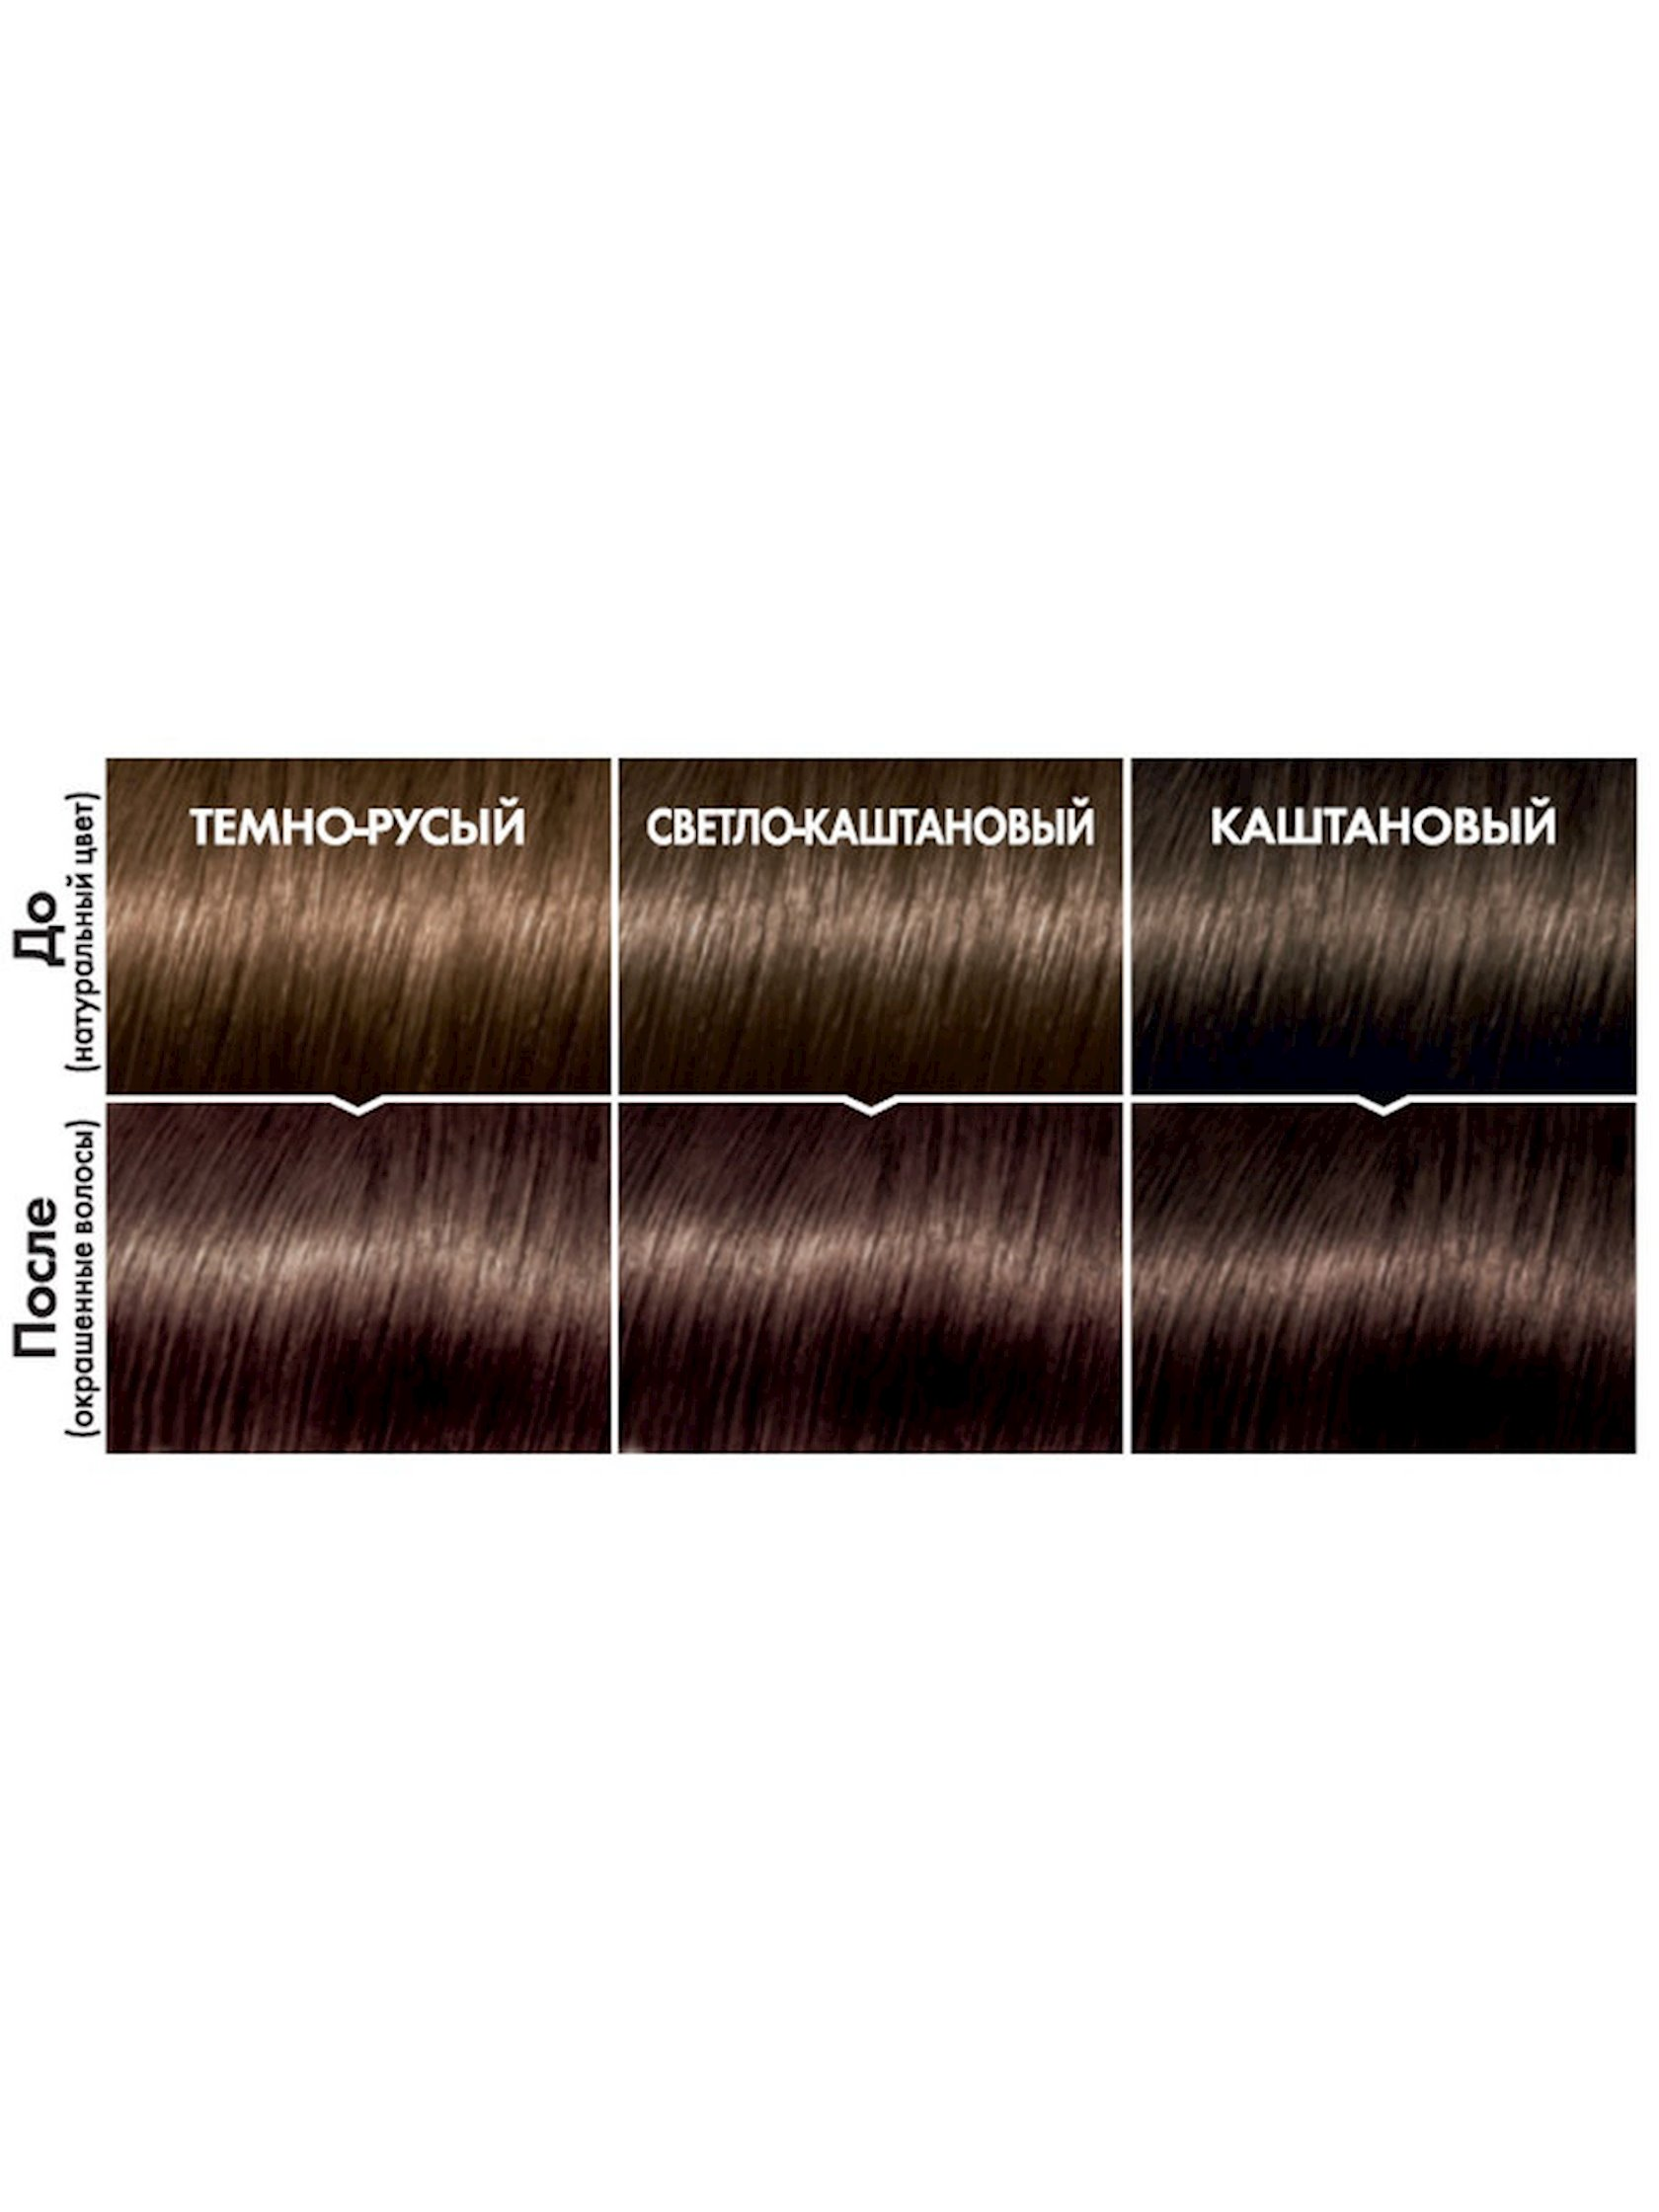 Saç üçün qalıcı krem-boya L'Oreal Paris Casting Creme Gloss ammonyaksız 515 Buzlu şokolad